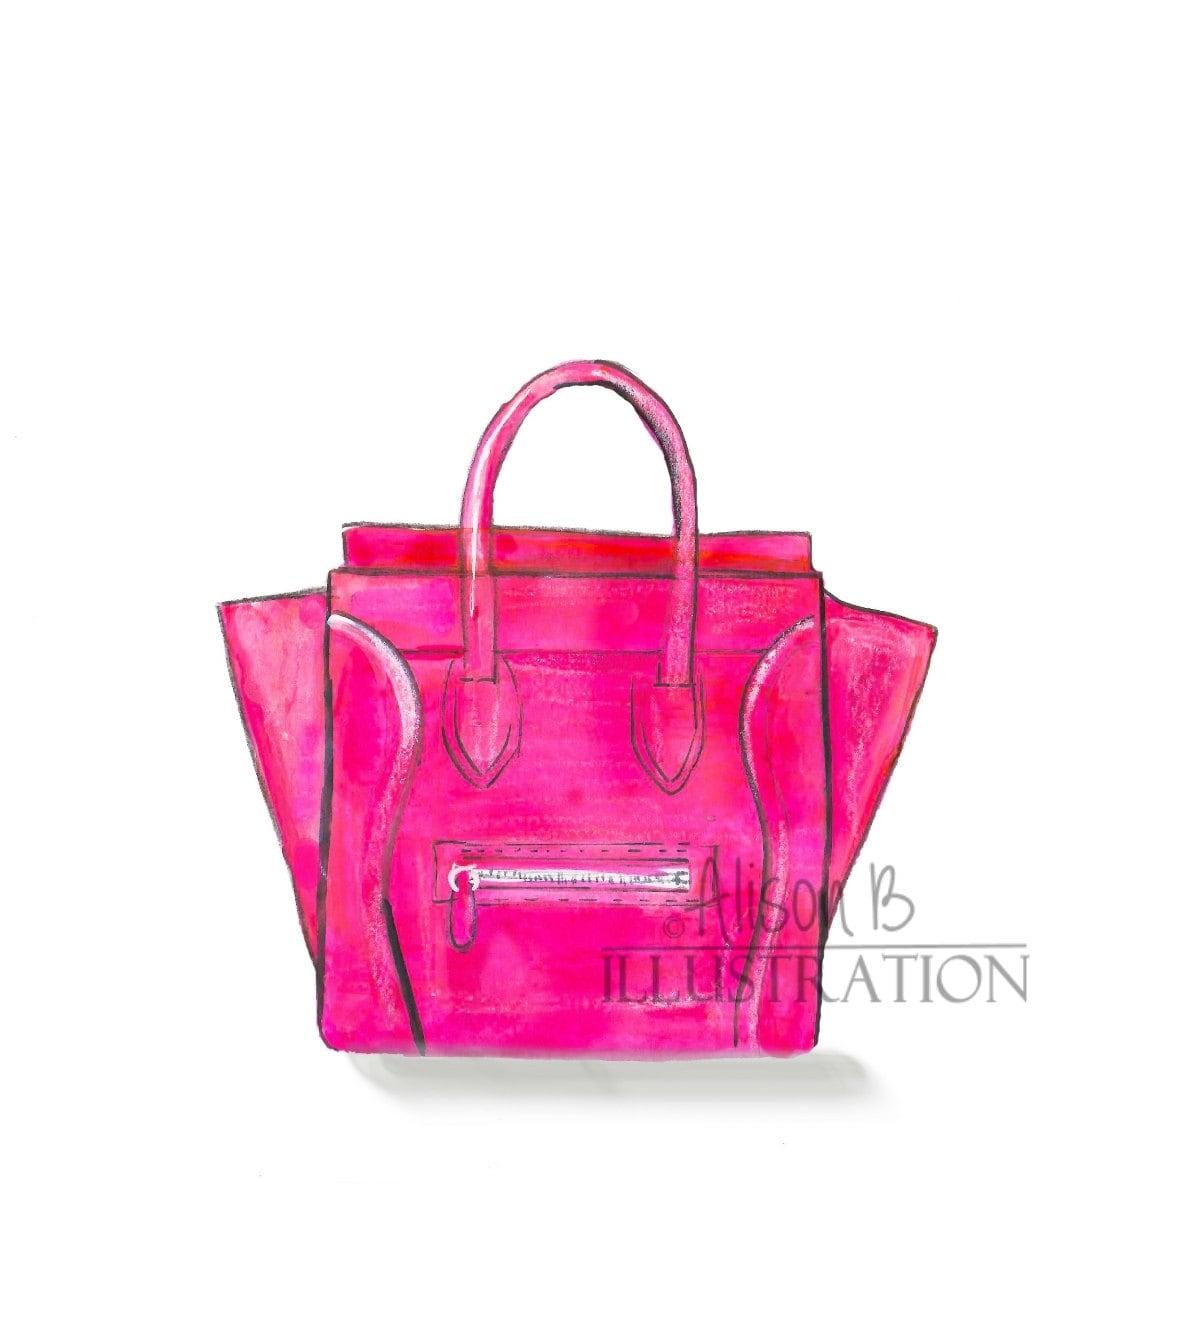 Popular items for celine bag on Etsy